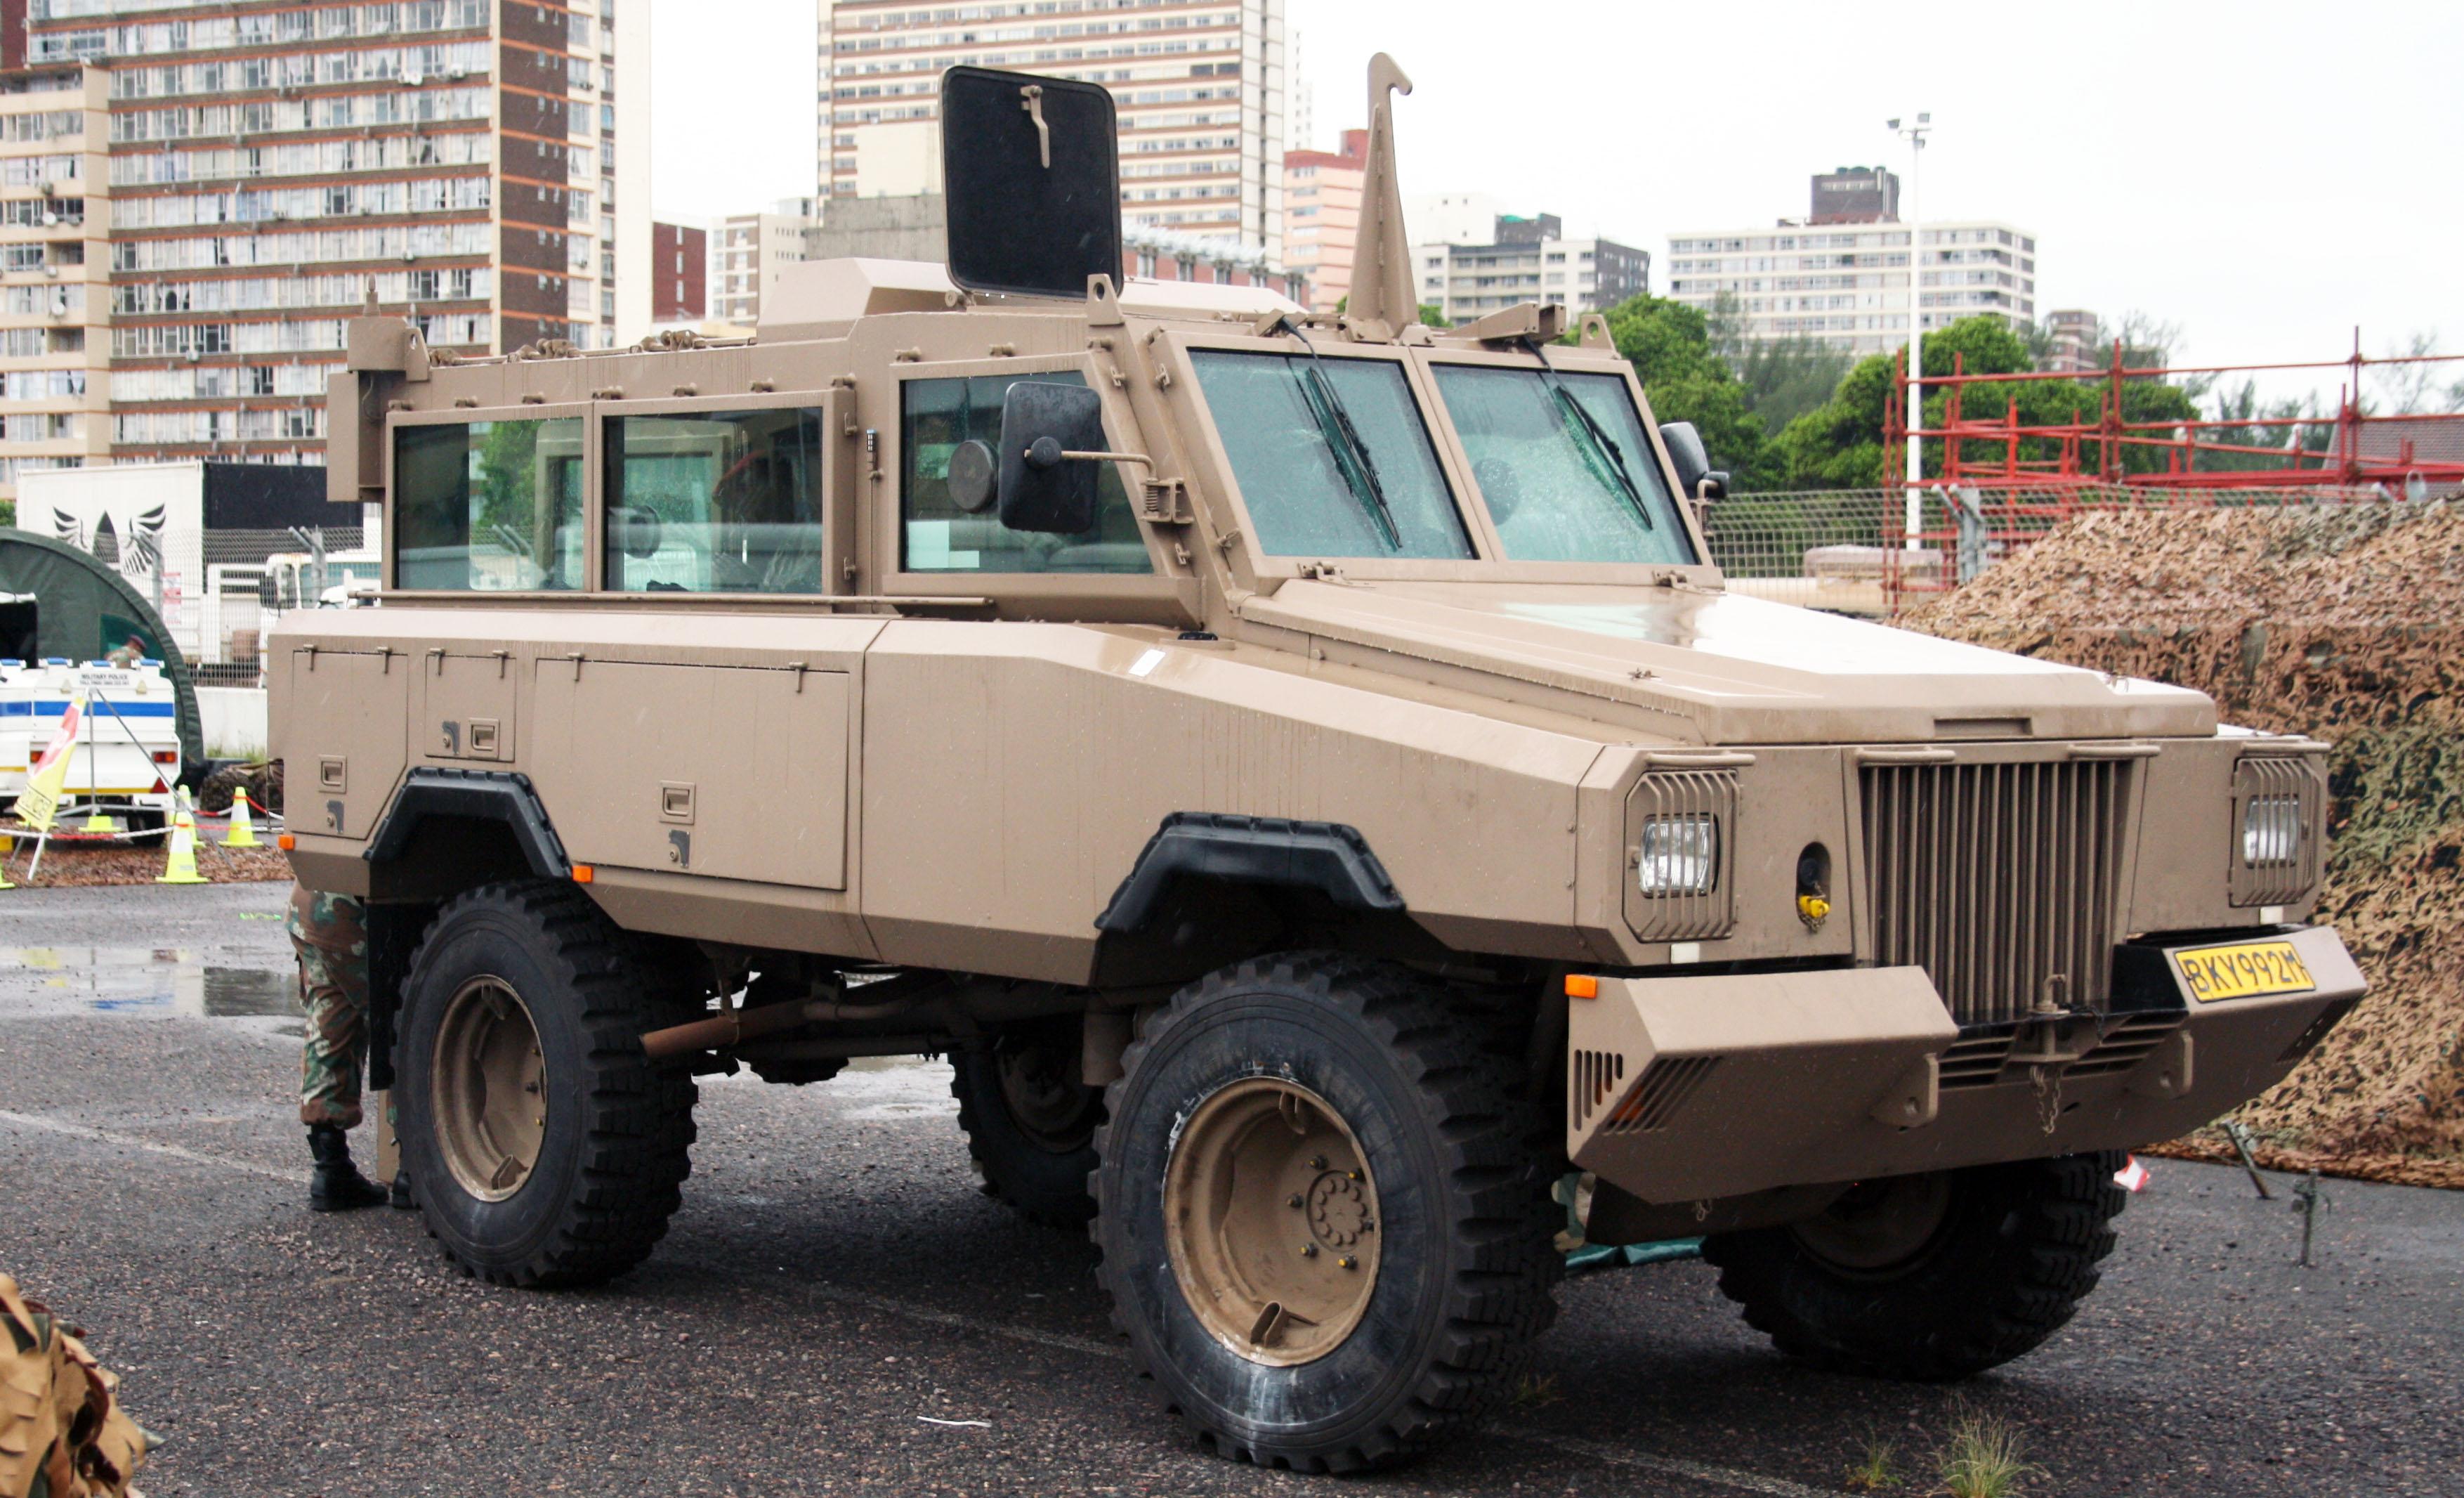 https://cdn.discordapp.com/attachments/510515265834844160/577884576177848370/SANDF_Armed_Forces_Day_2017_-_South_African_Army_Mamba_MkIII_APC_32203158584.jpg